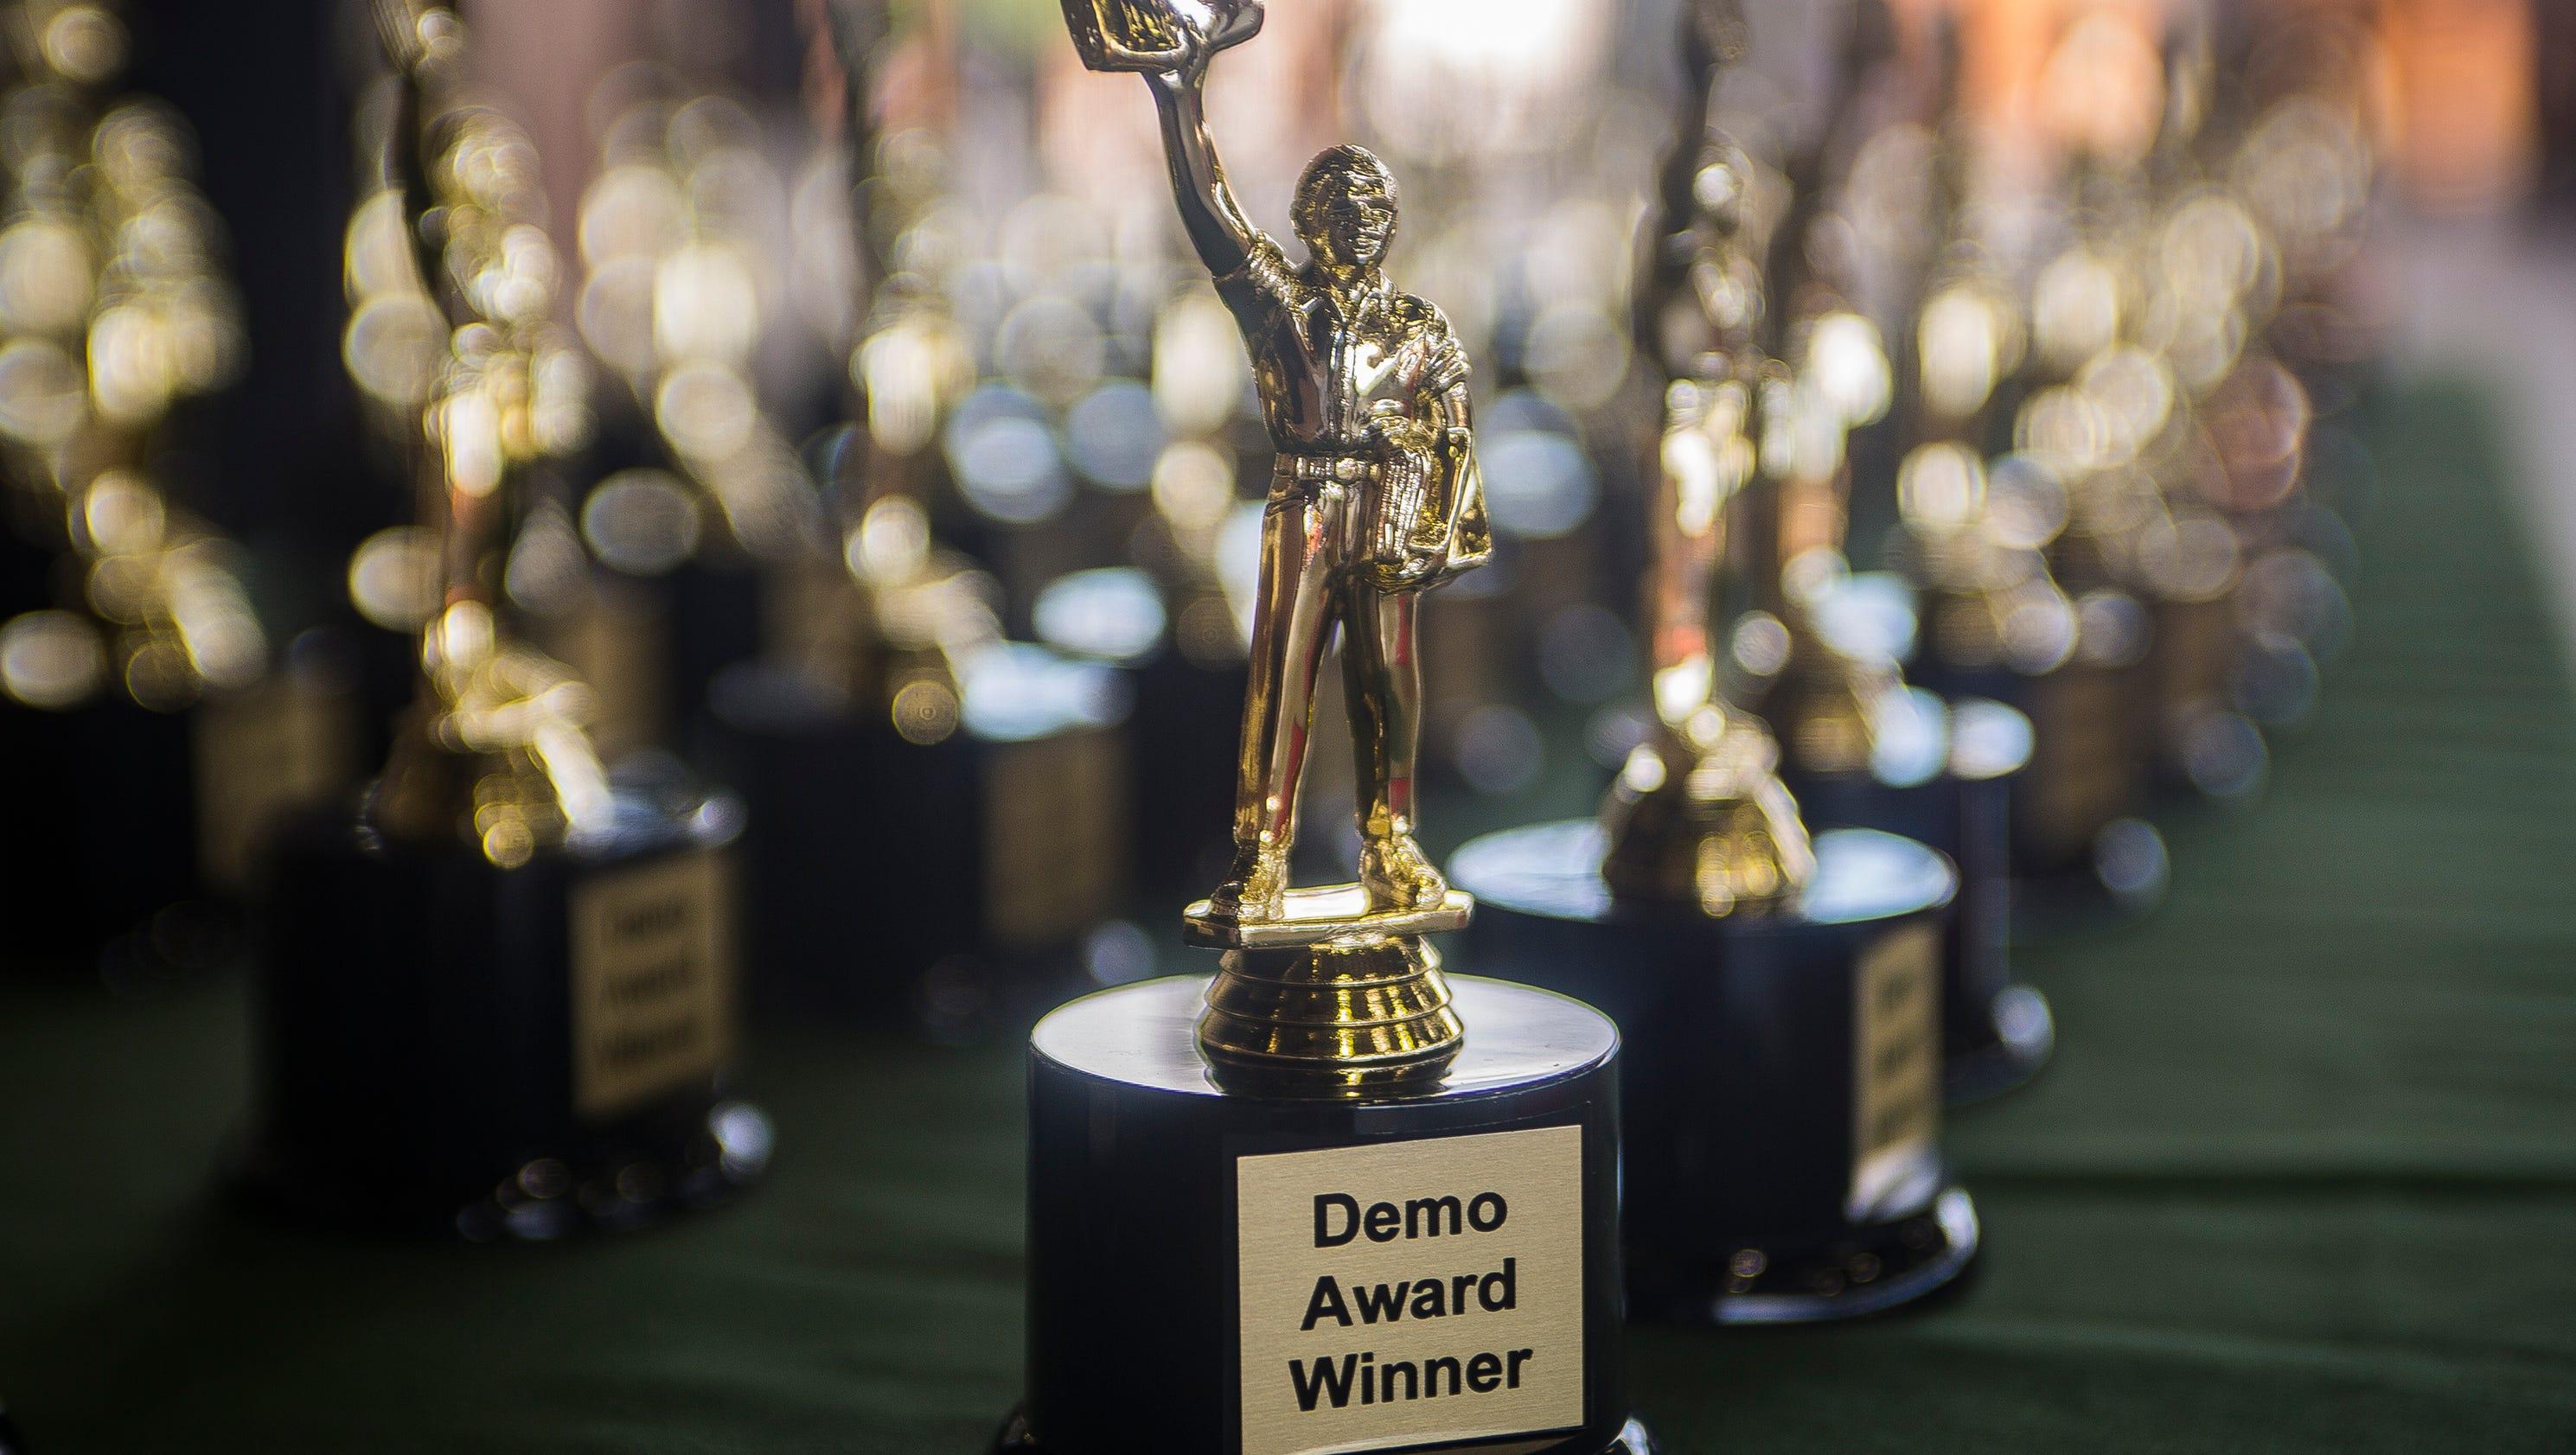 demo award winners